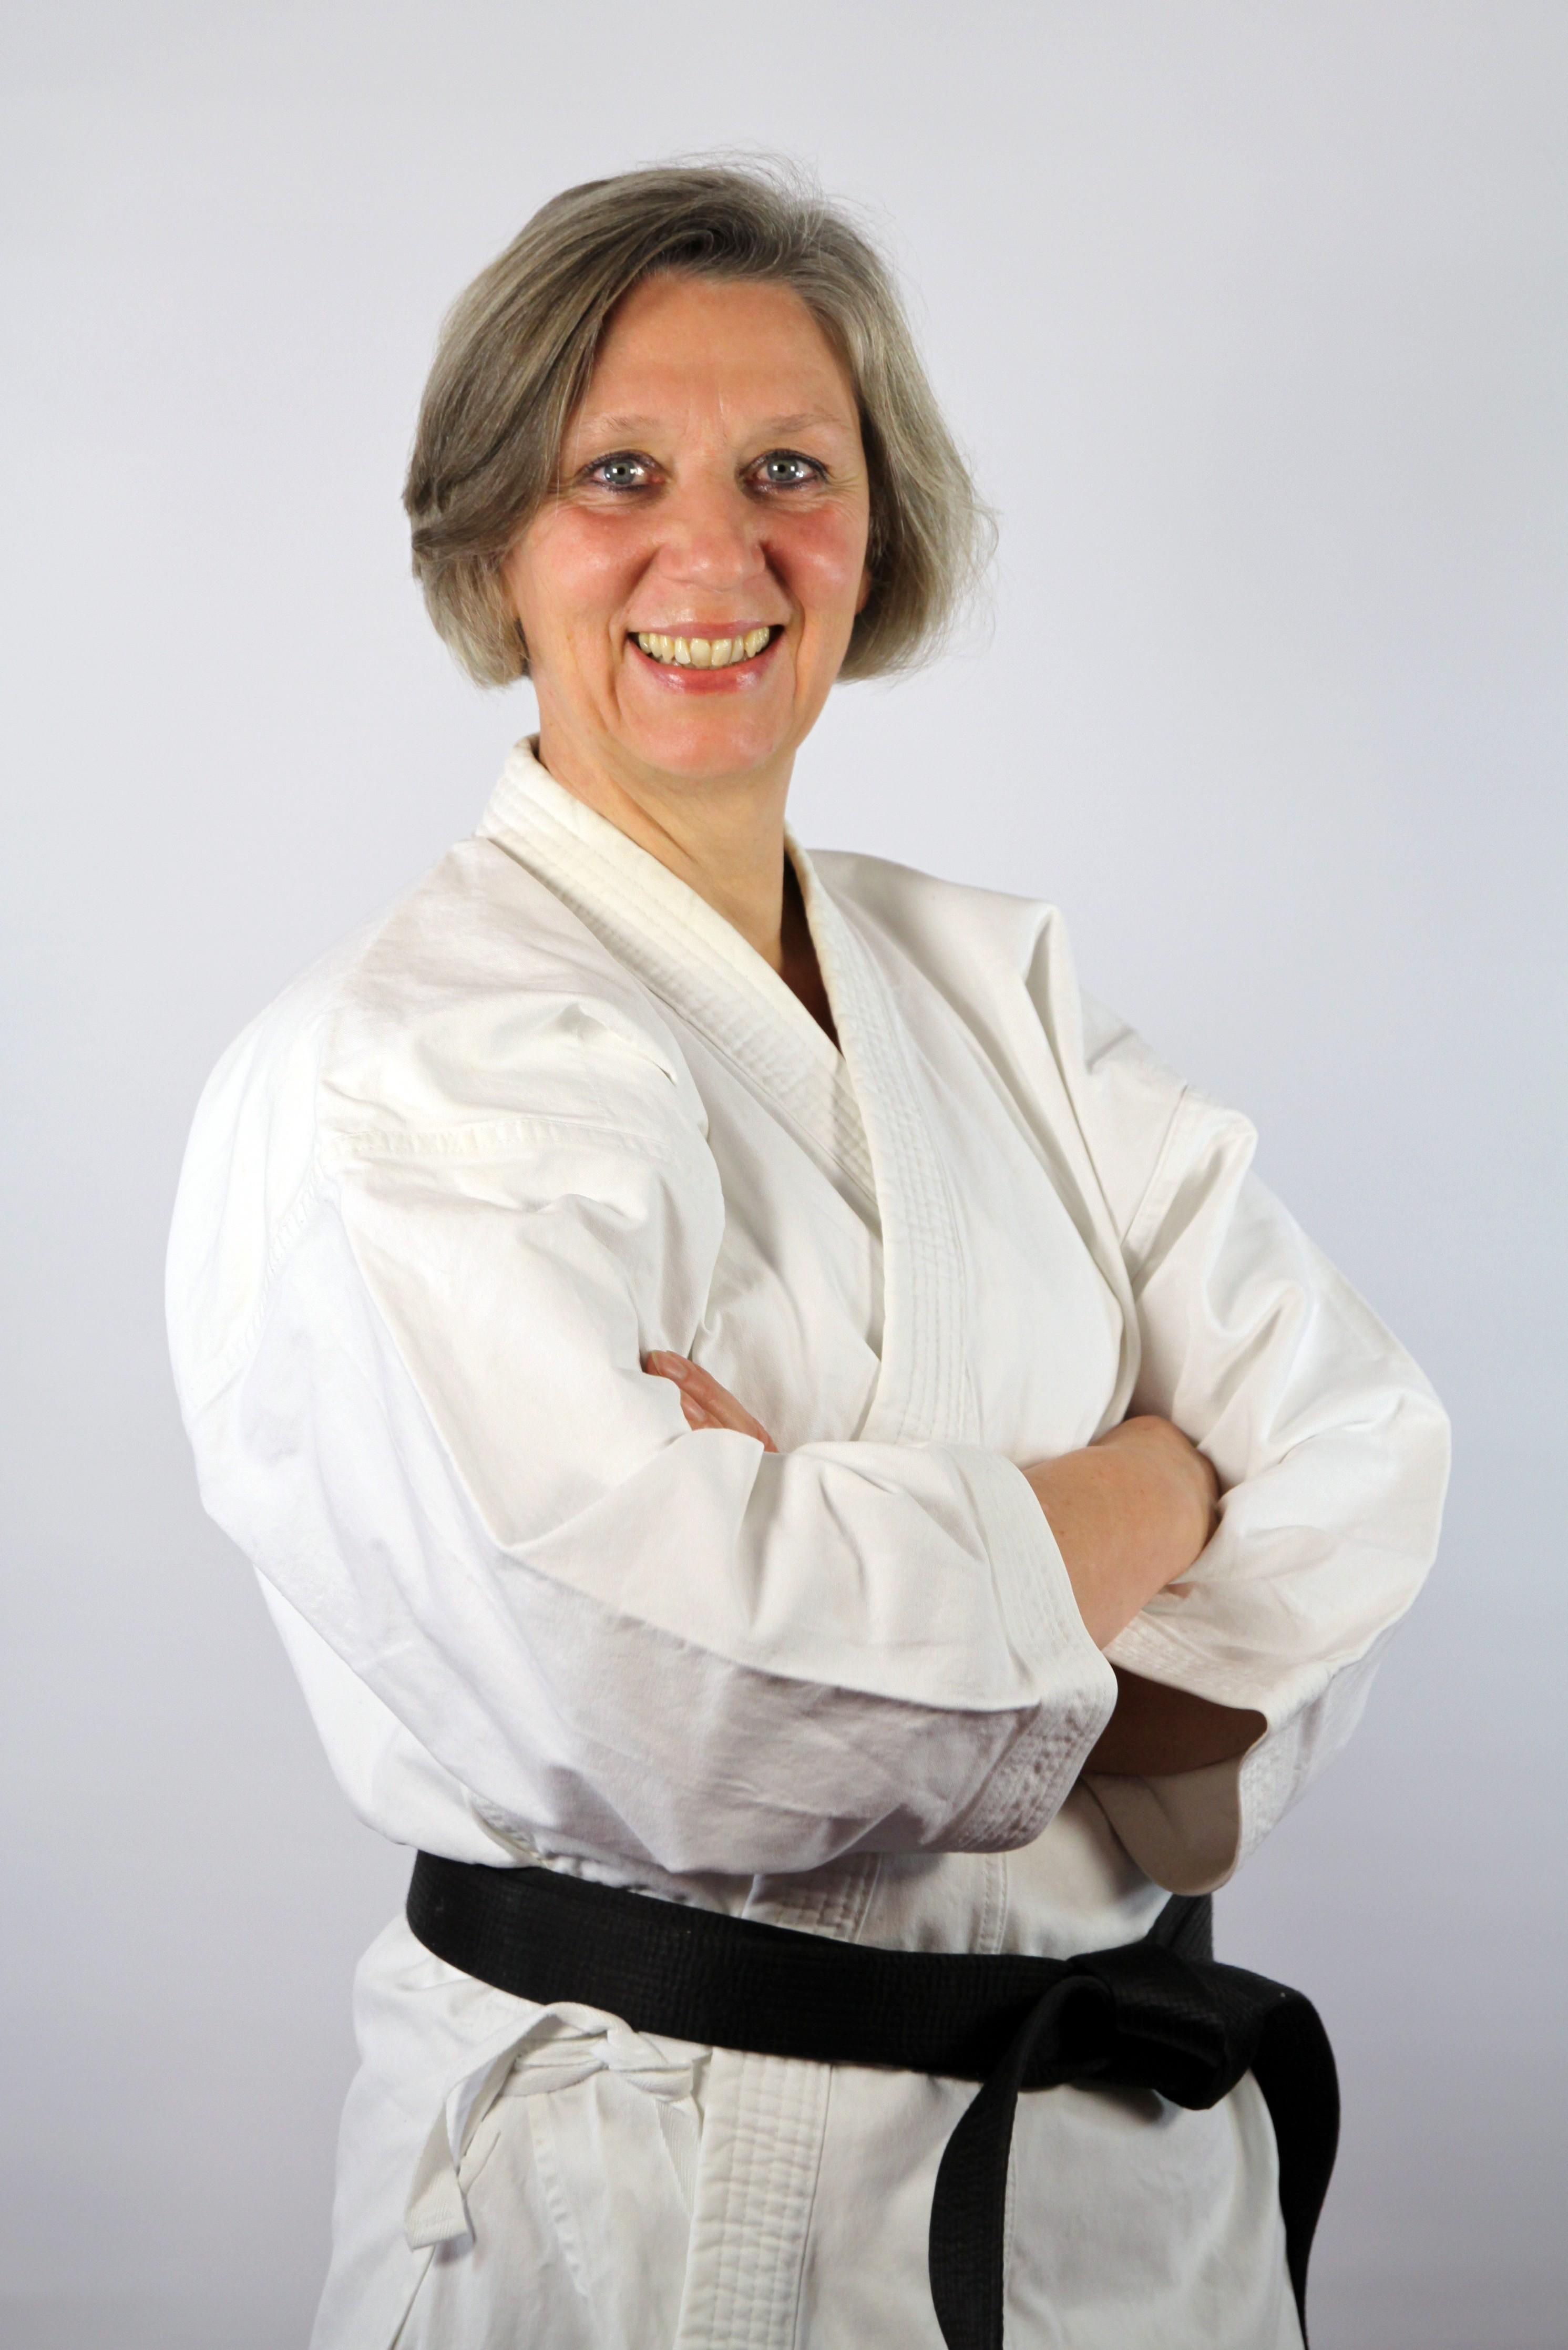 Anja von Kanitz